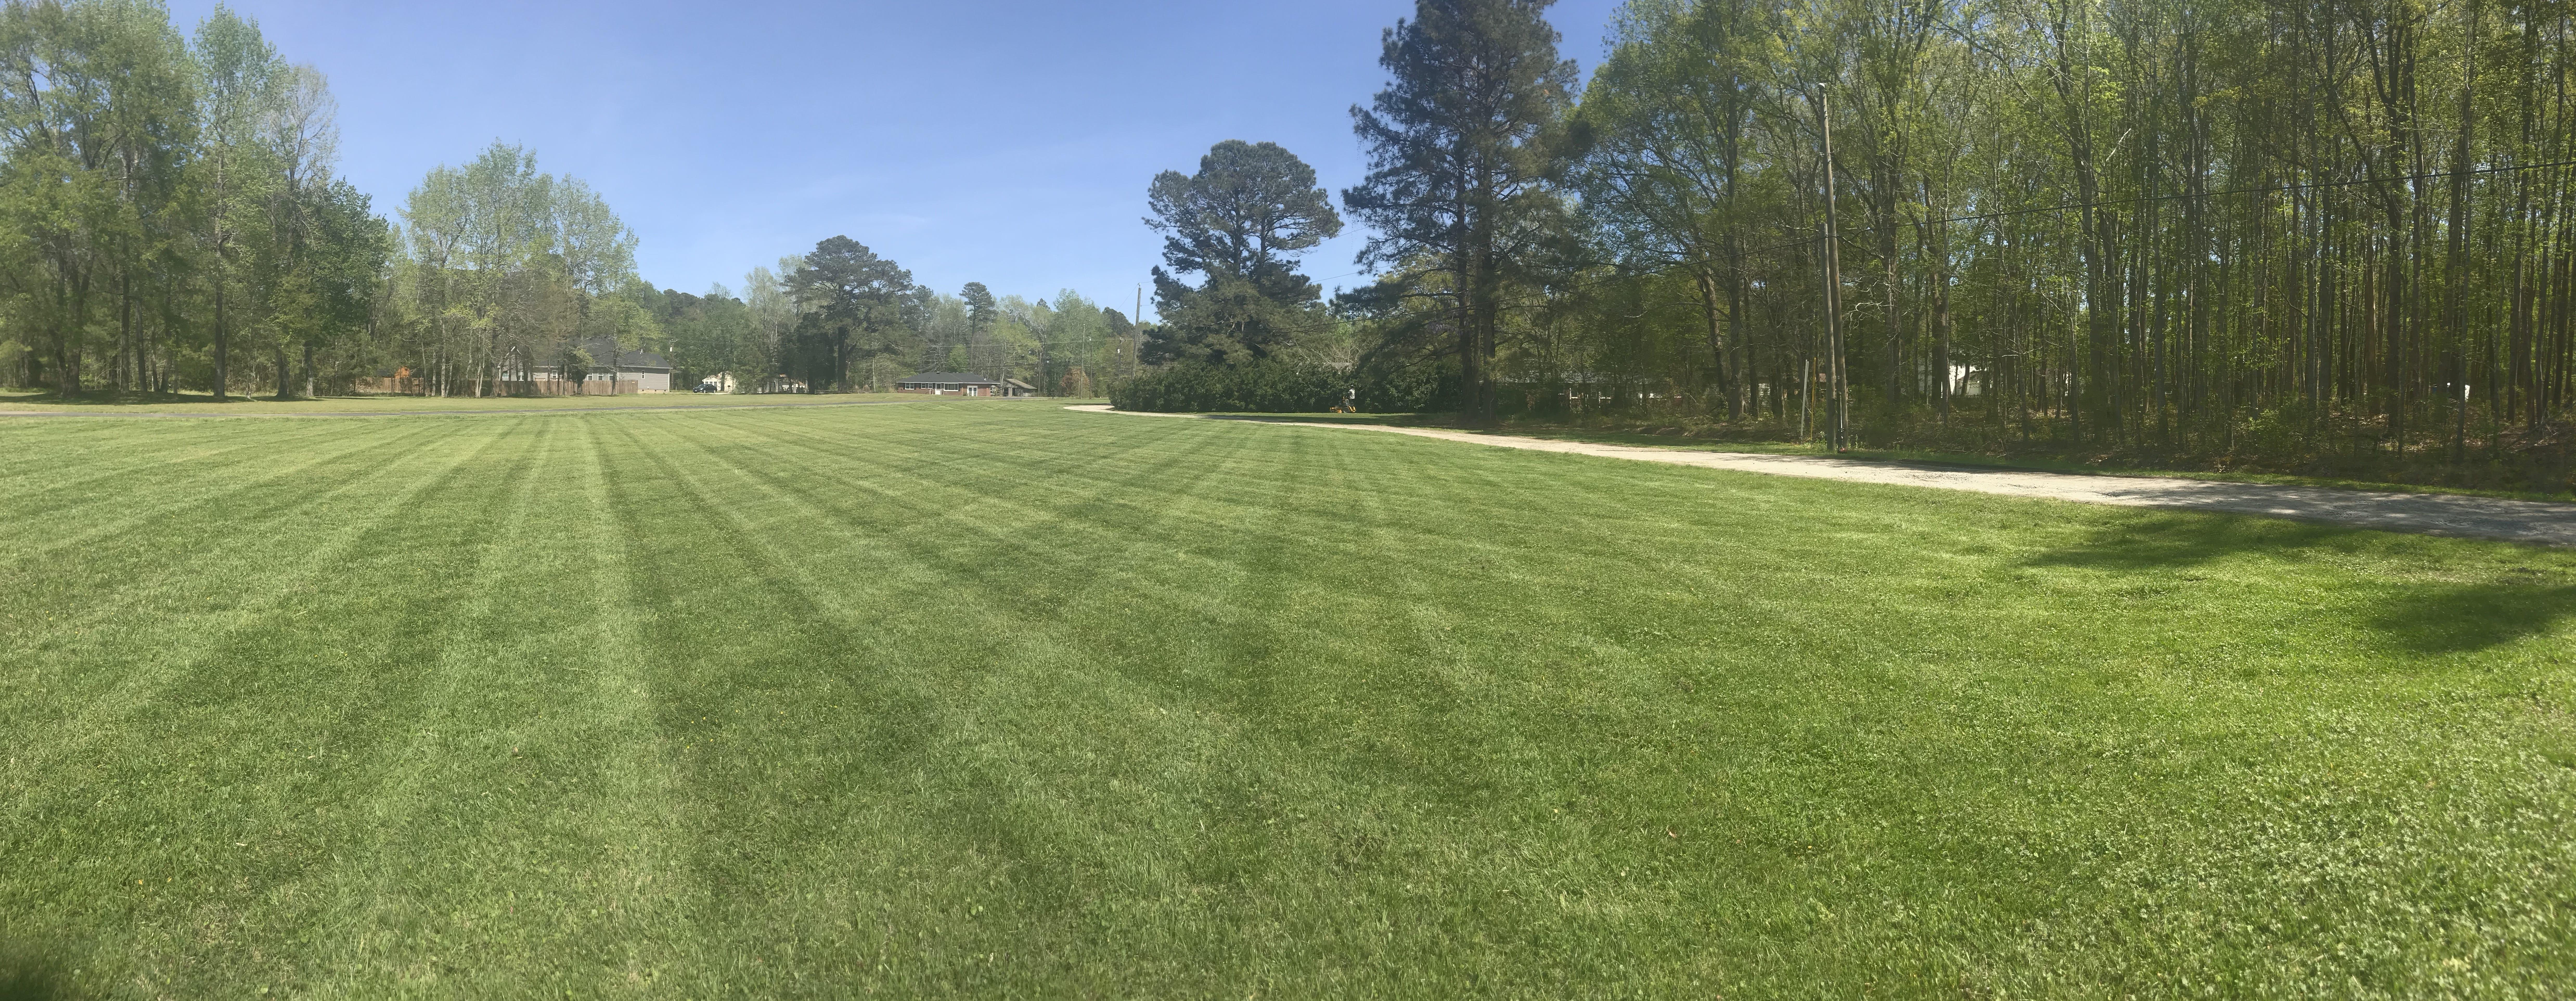 Landscaping Contractor Landscaper Chesapeake Va Good N Green